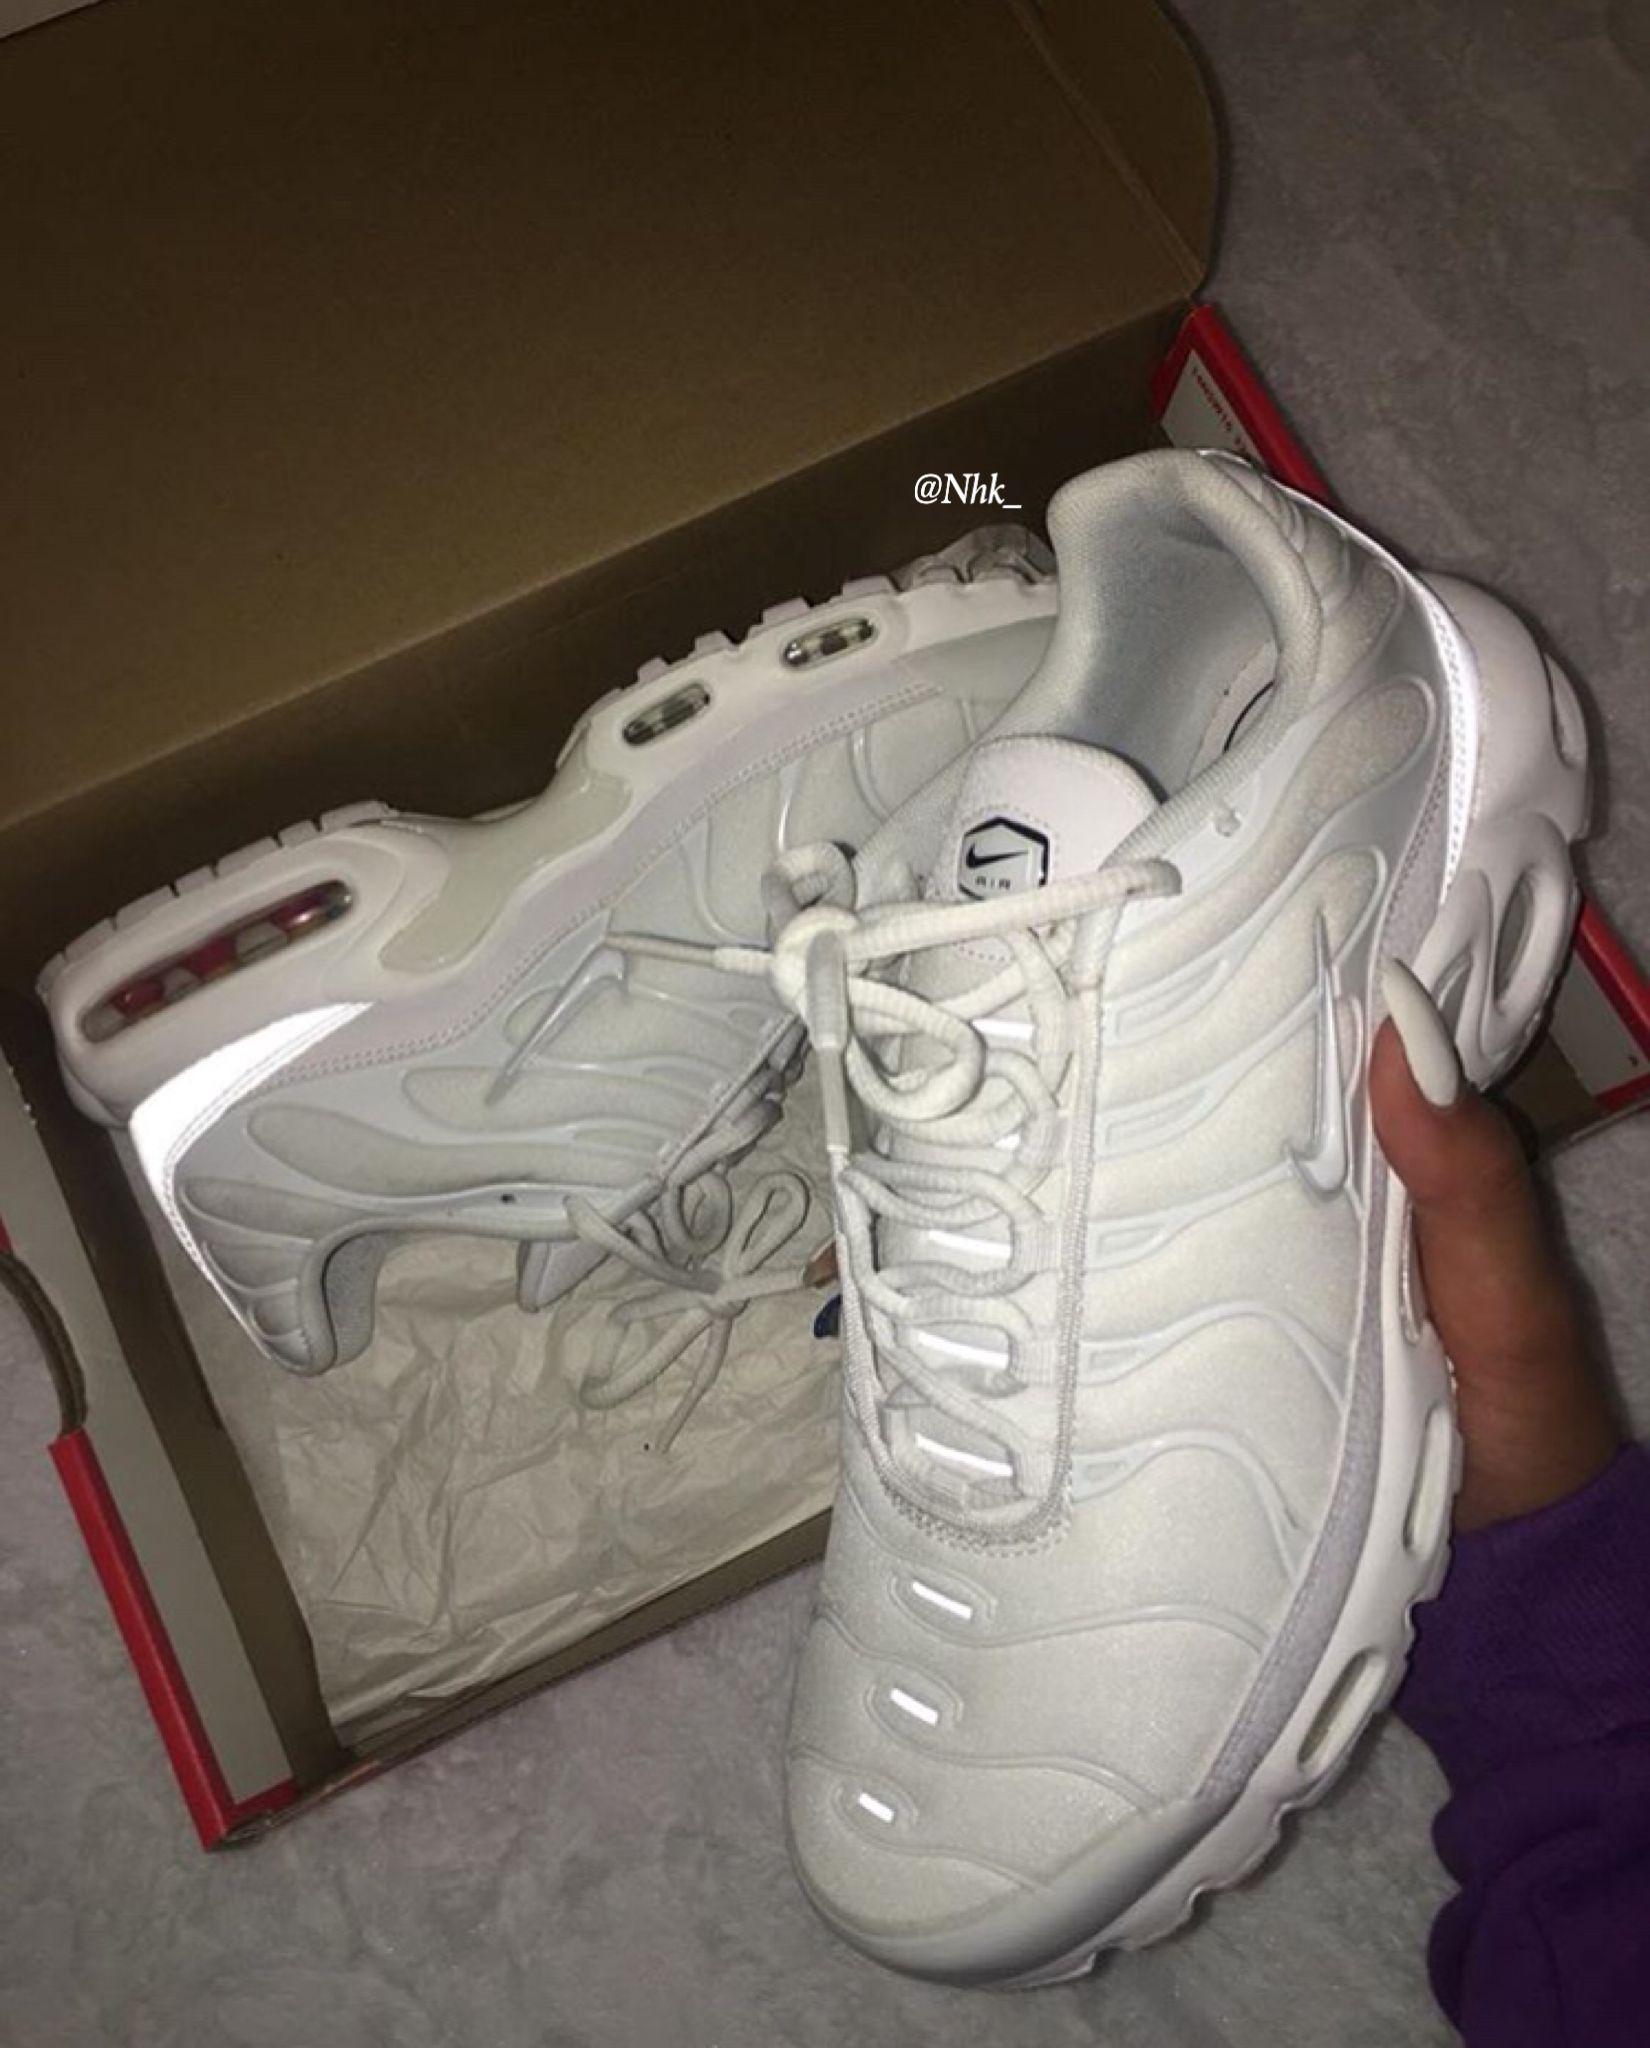 @TheBritttt #shoegame